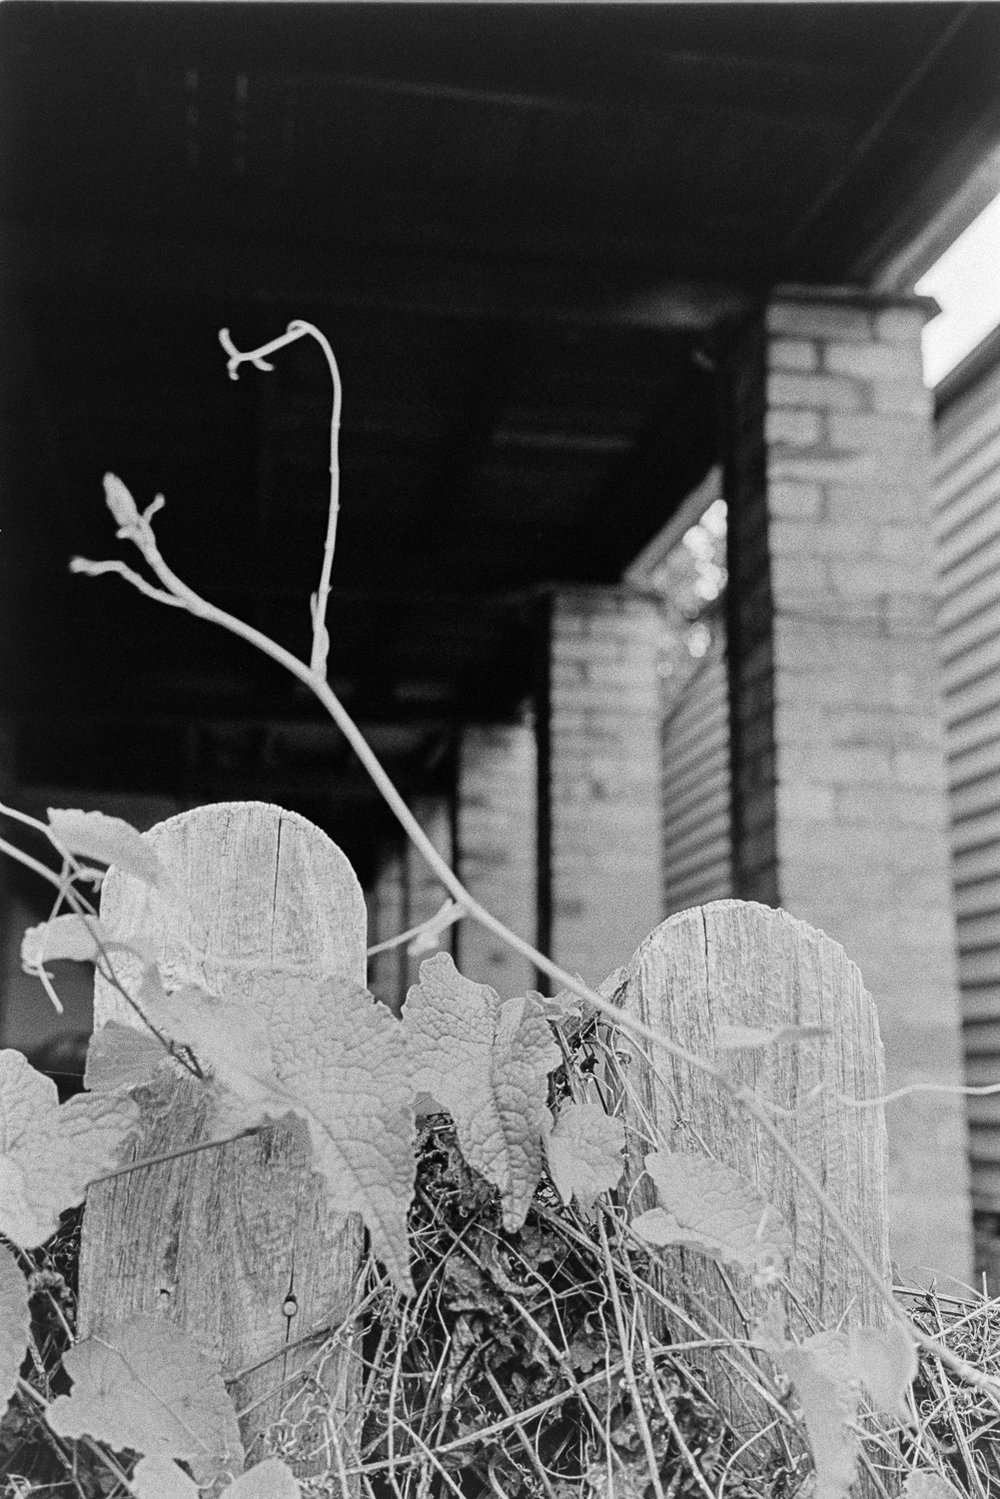 20181209 - Roll 267 - 013-Nick-Bedford,-Photographer-Black and White, Brisbane, Kodak TRI-X 400, Leica M7, Street Photography, Voigtlander 35mm F1.7.jpg